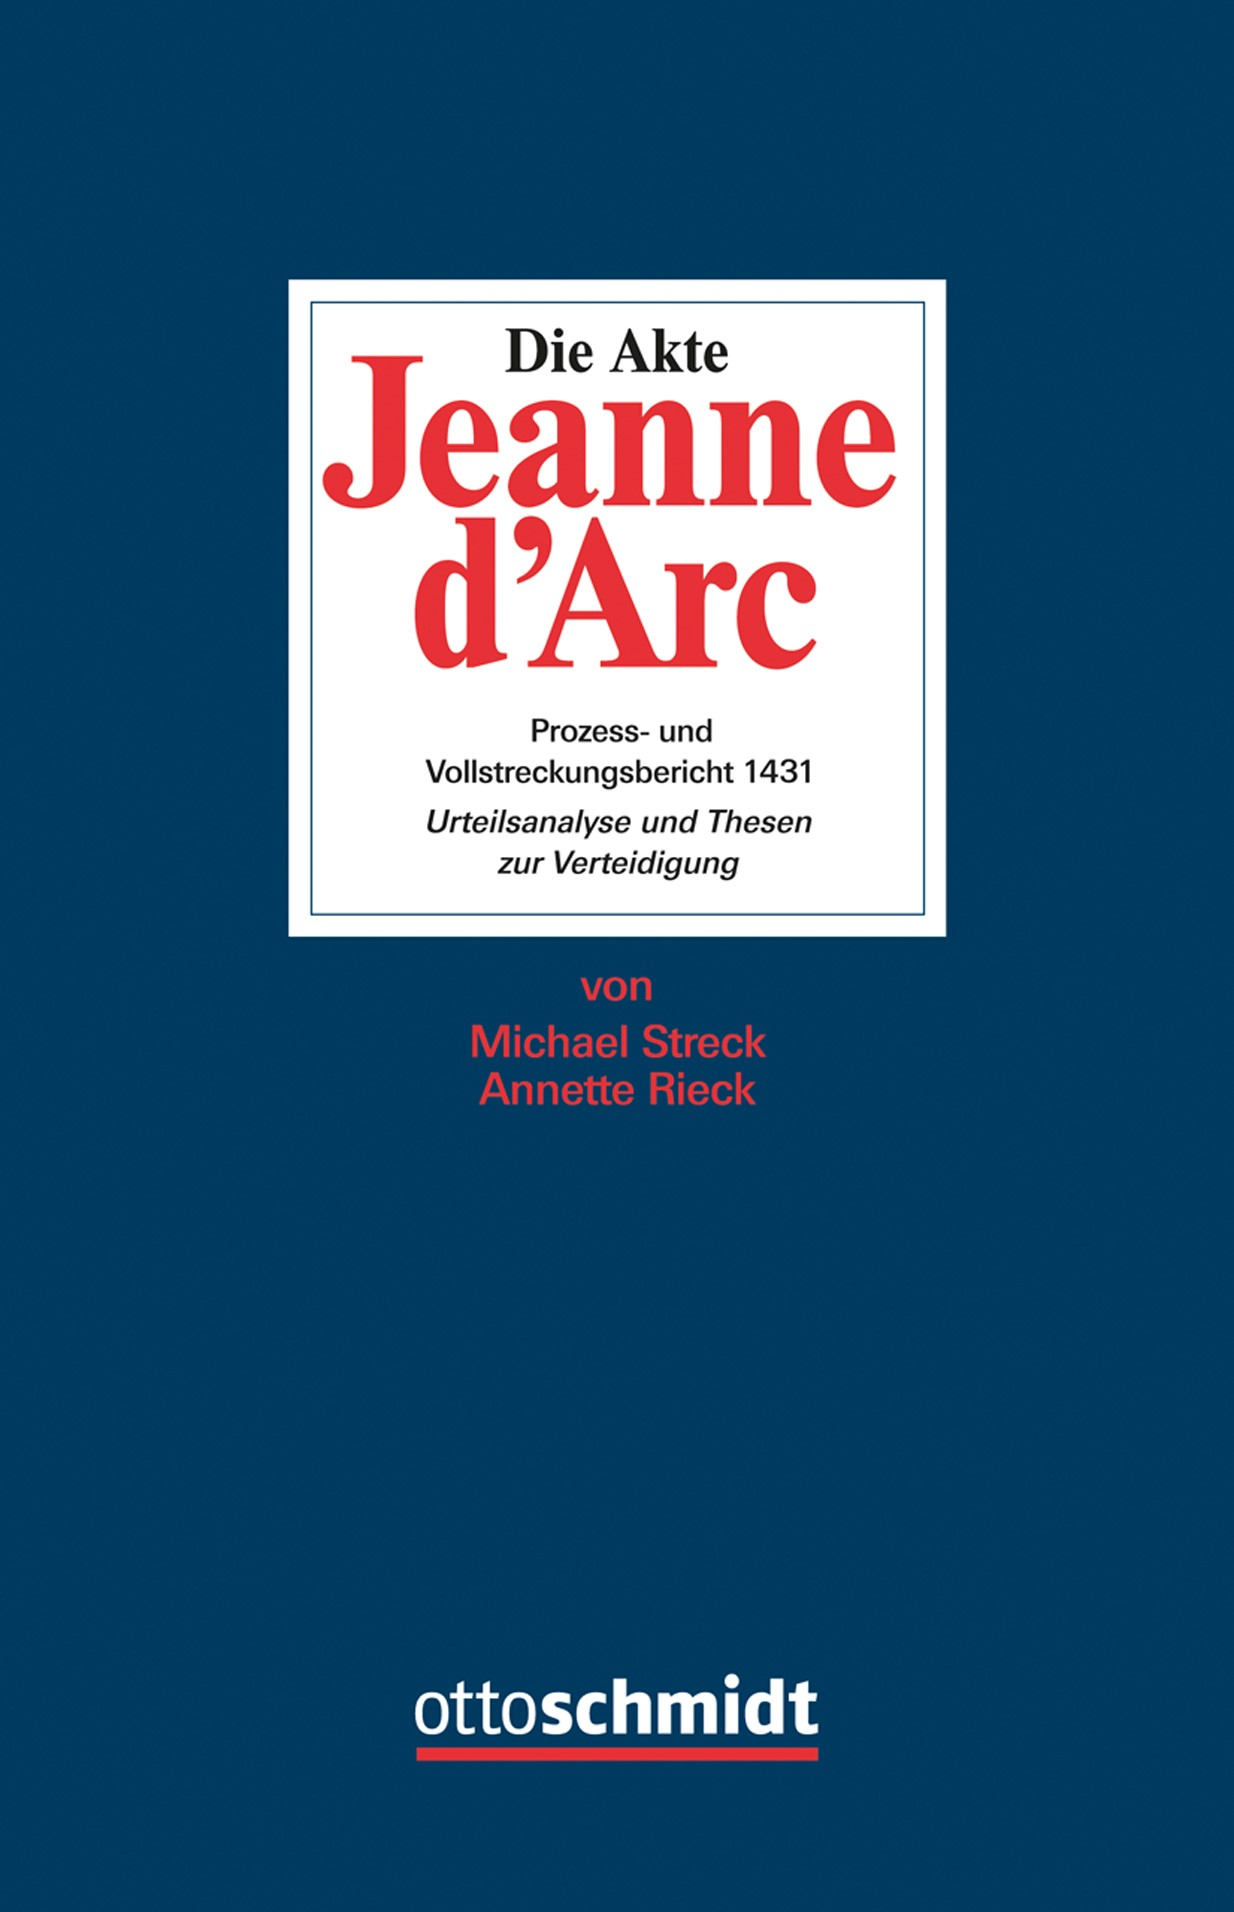 Die Akte Jeanne d'Arc | Rieck / Streck, 2017 | Buch (Cover)